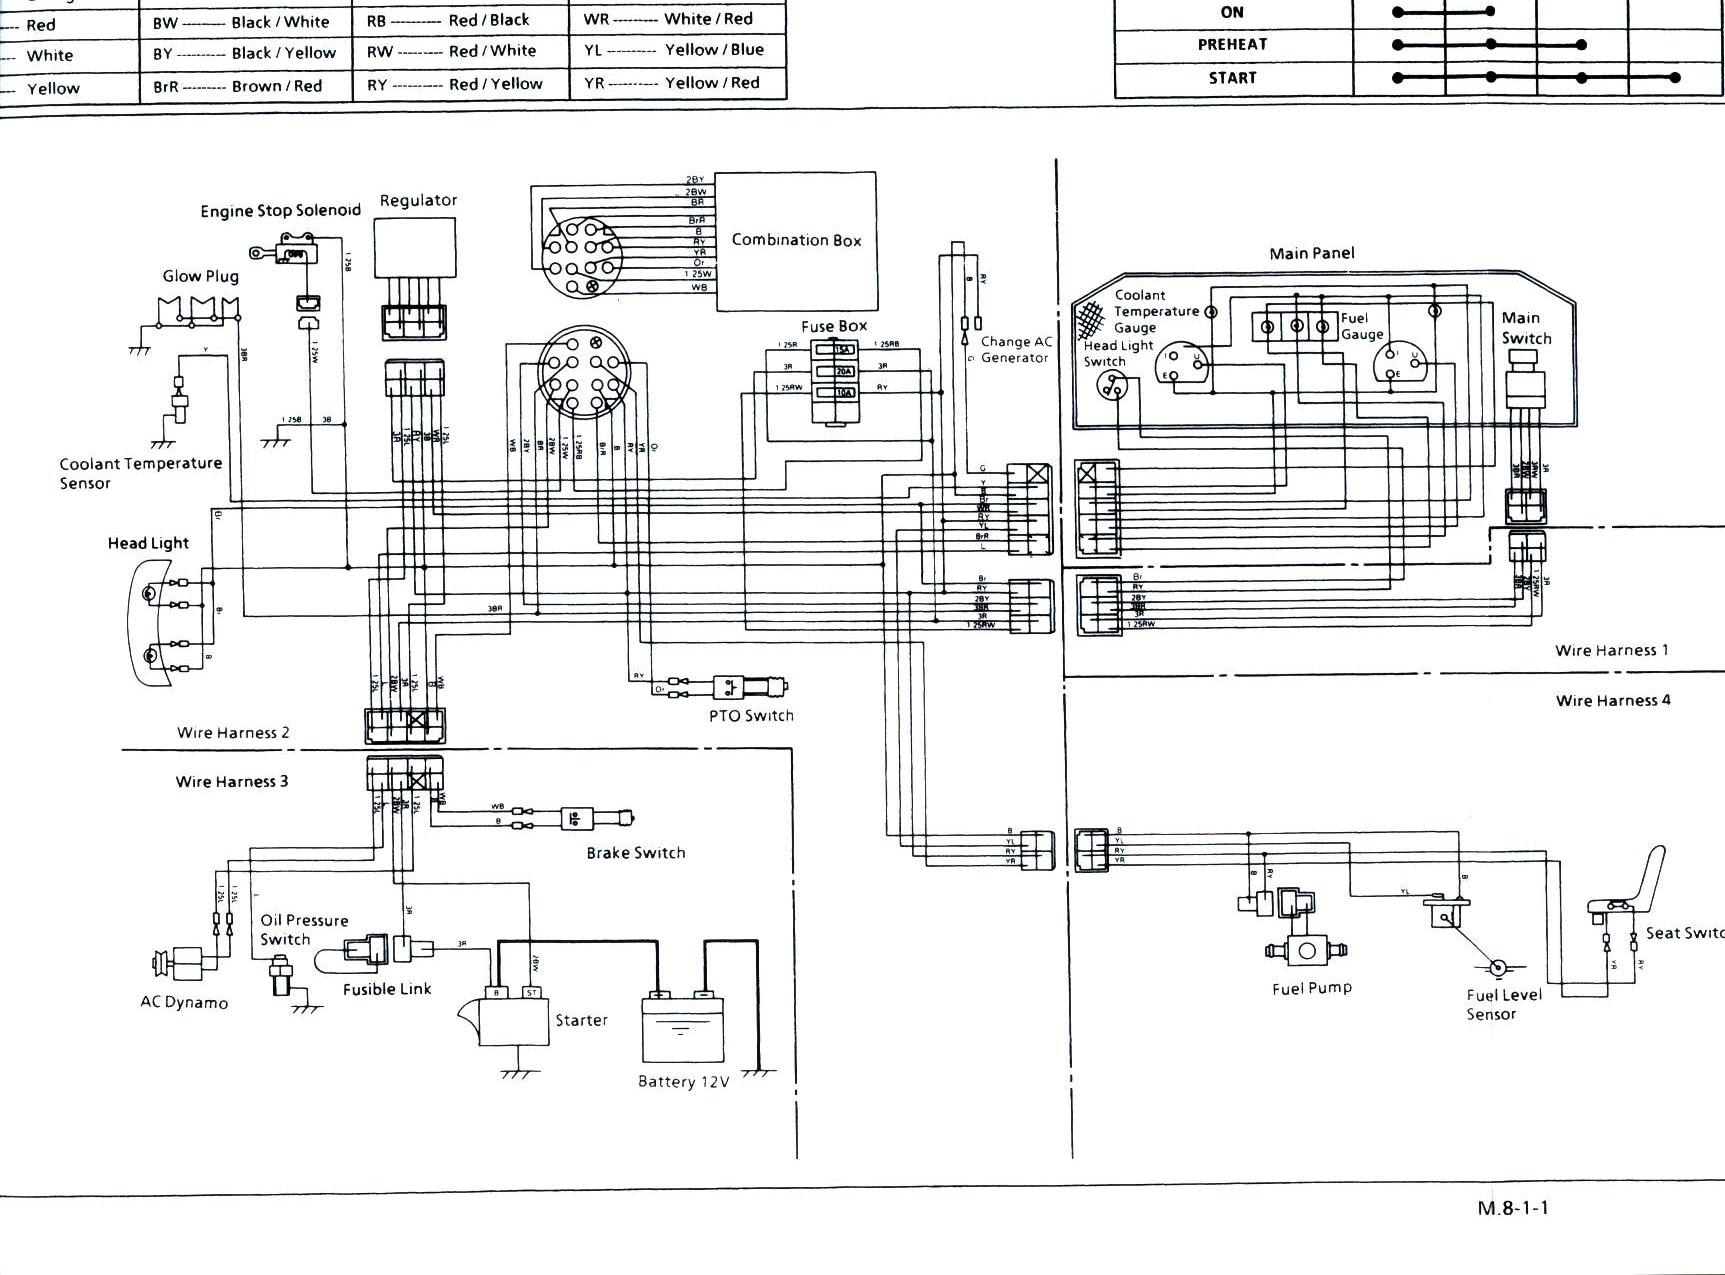 1947 john deere b tractor tractor repair wiring diagram kubota g1800 wiring diagram on 1947 john deere b tractor